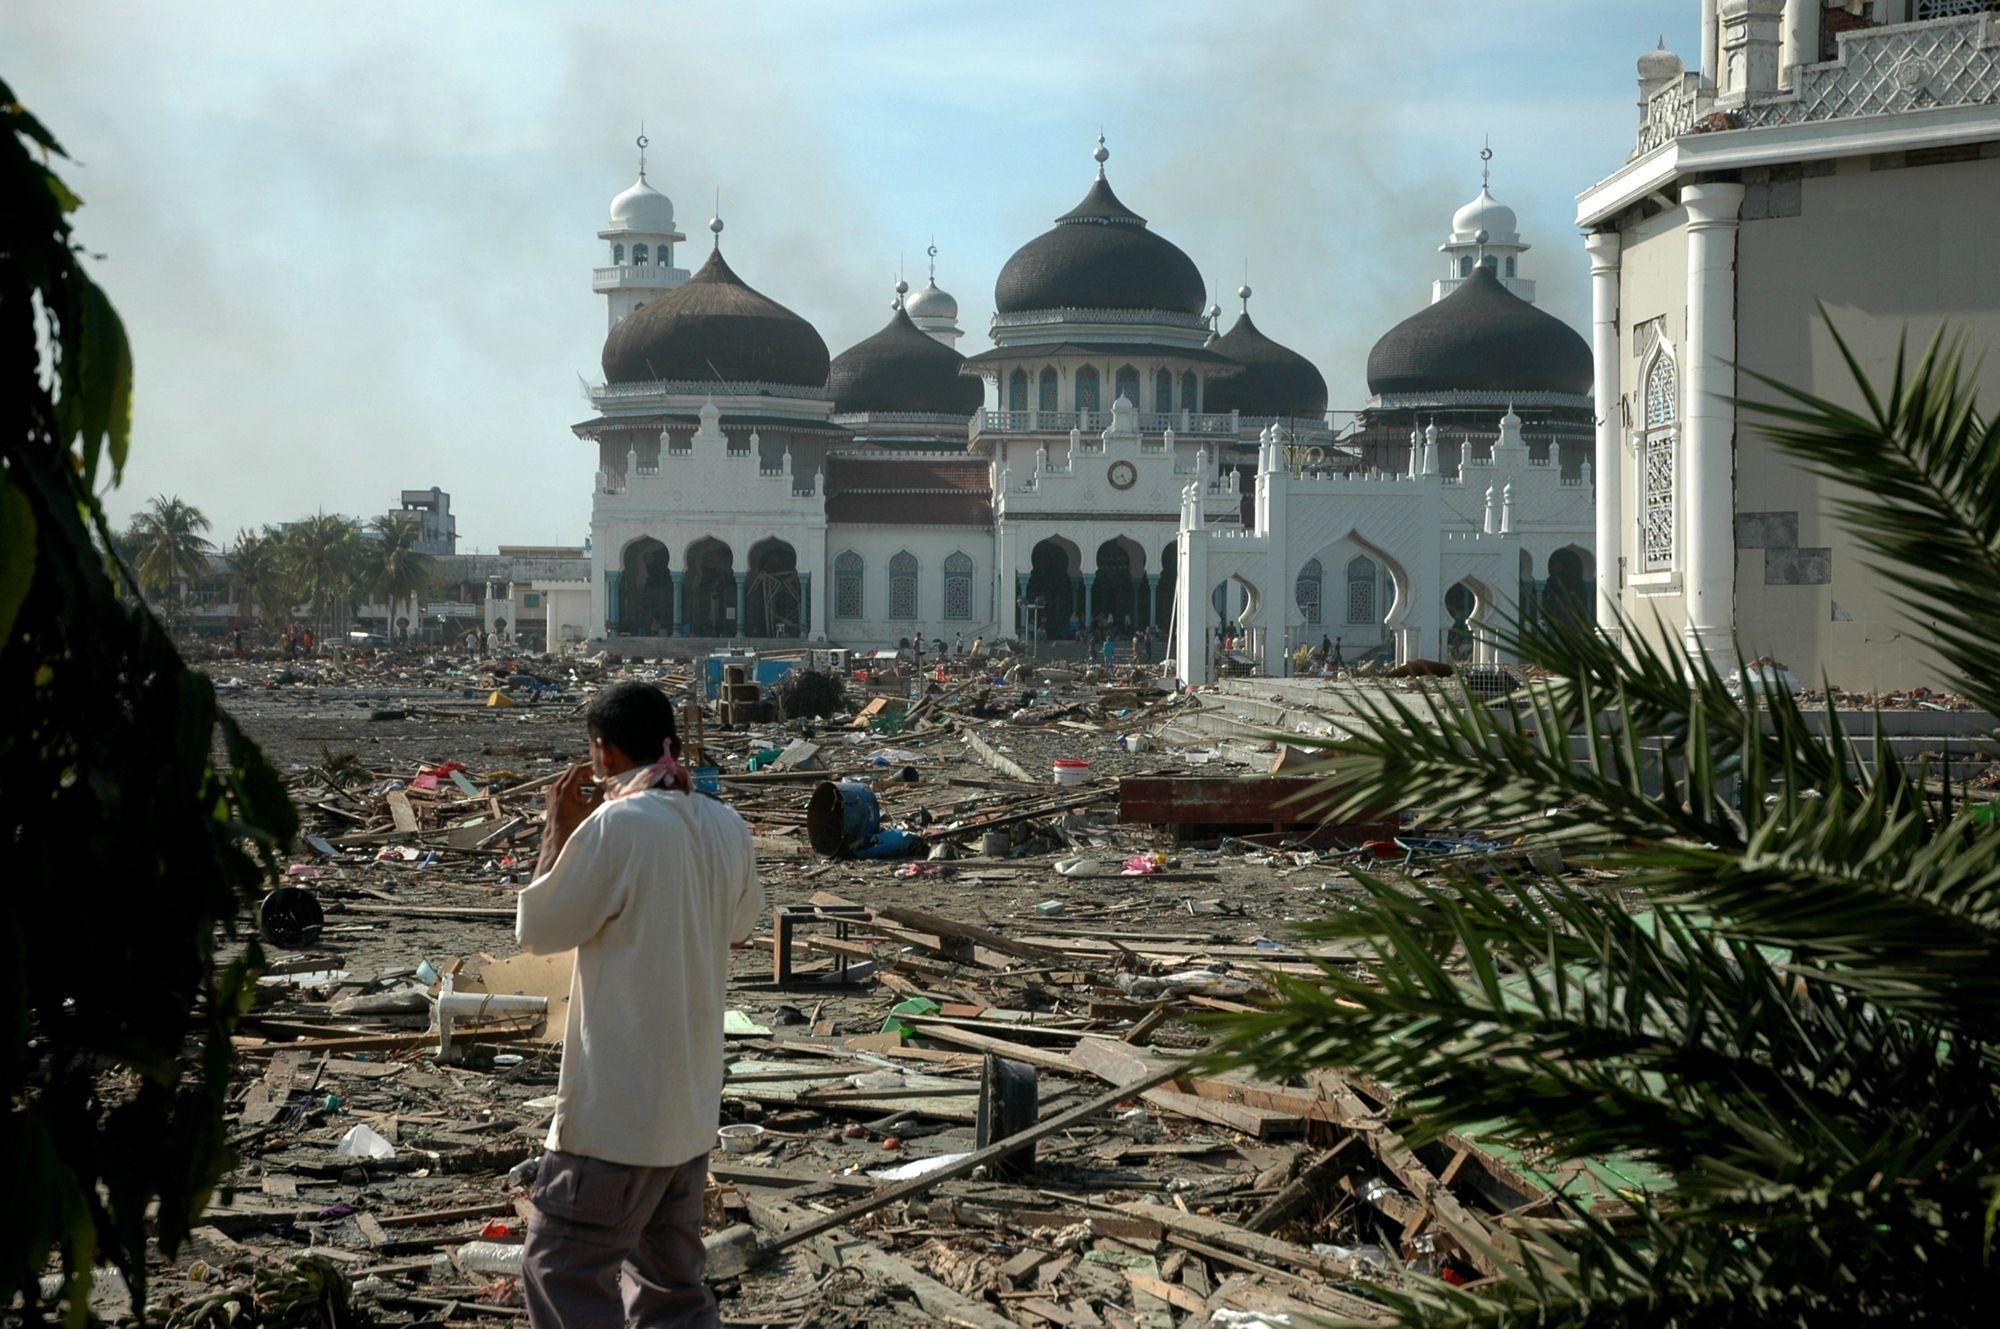 Baiturrahman Moschee in Banda Aceh nach dem Tsunami in 2004